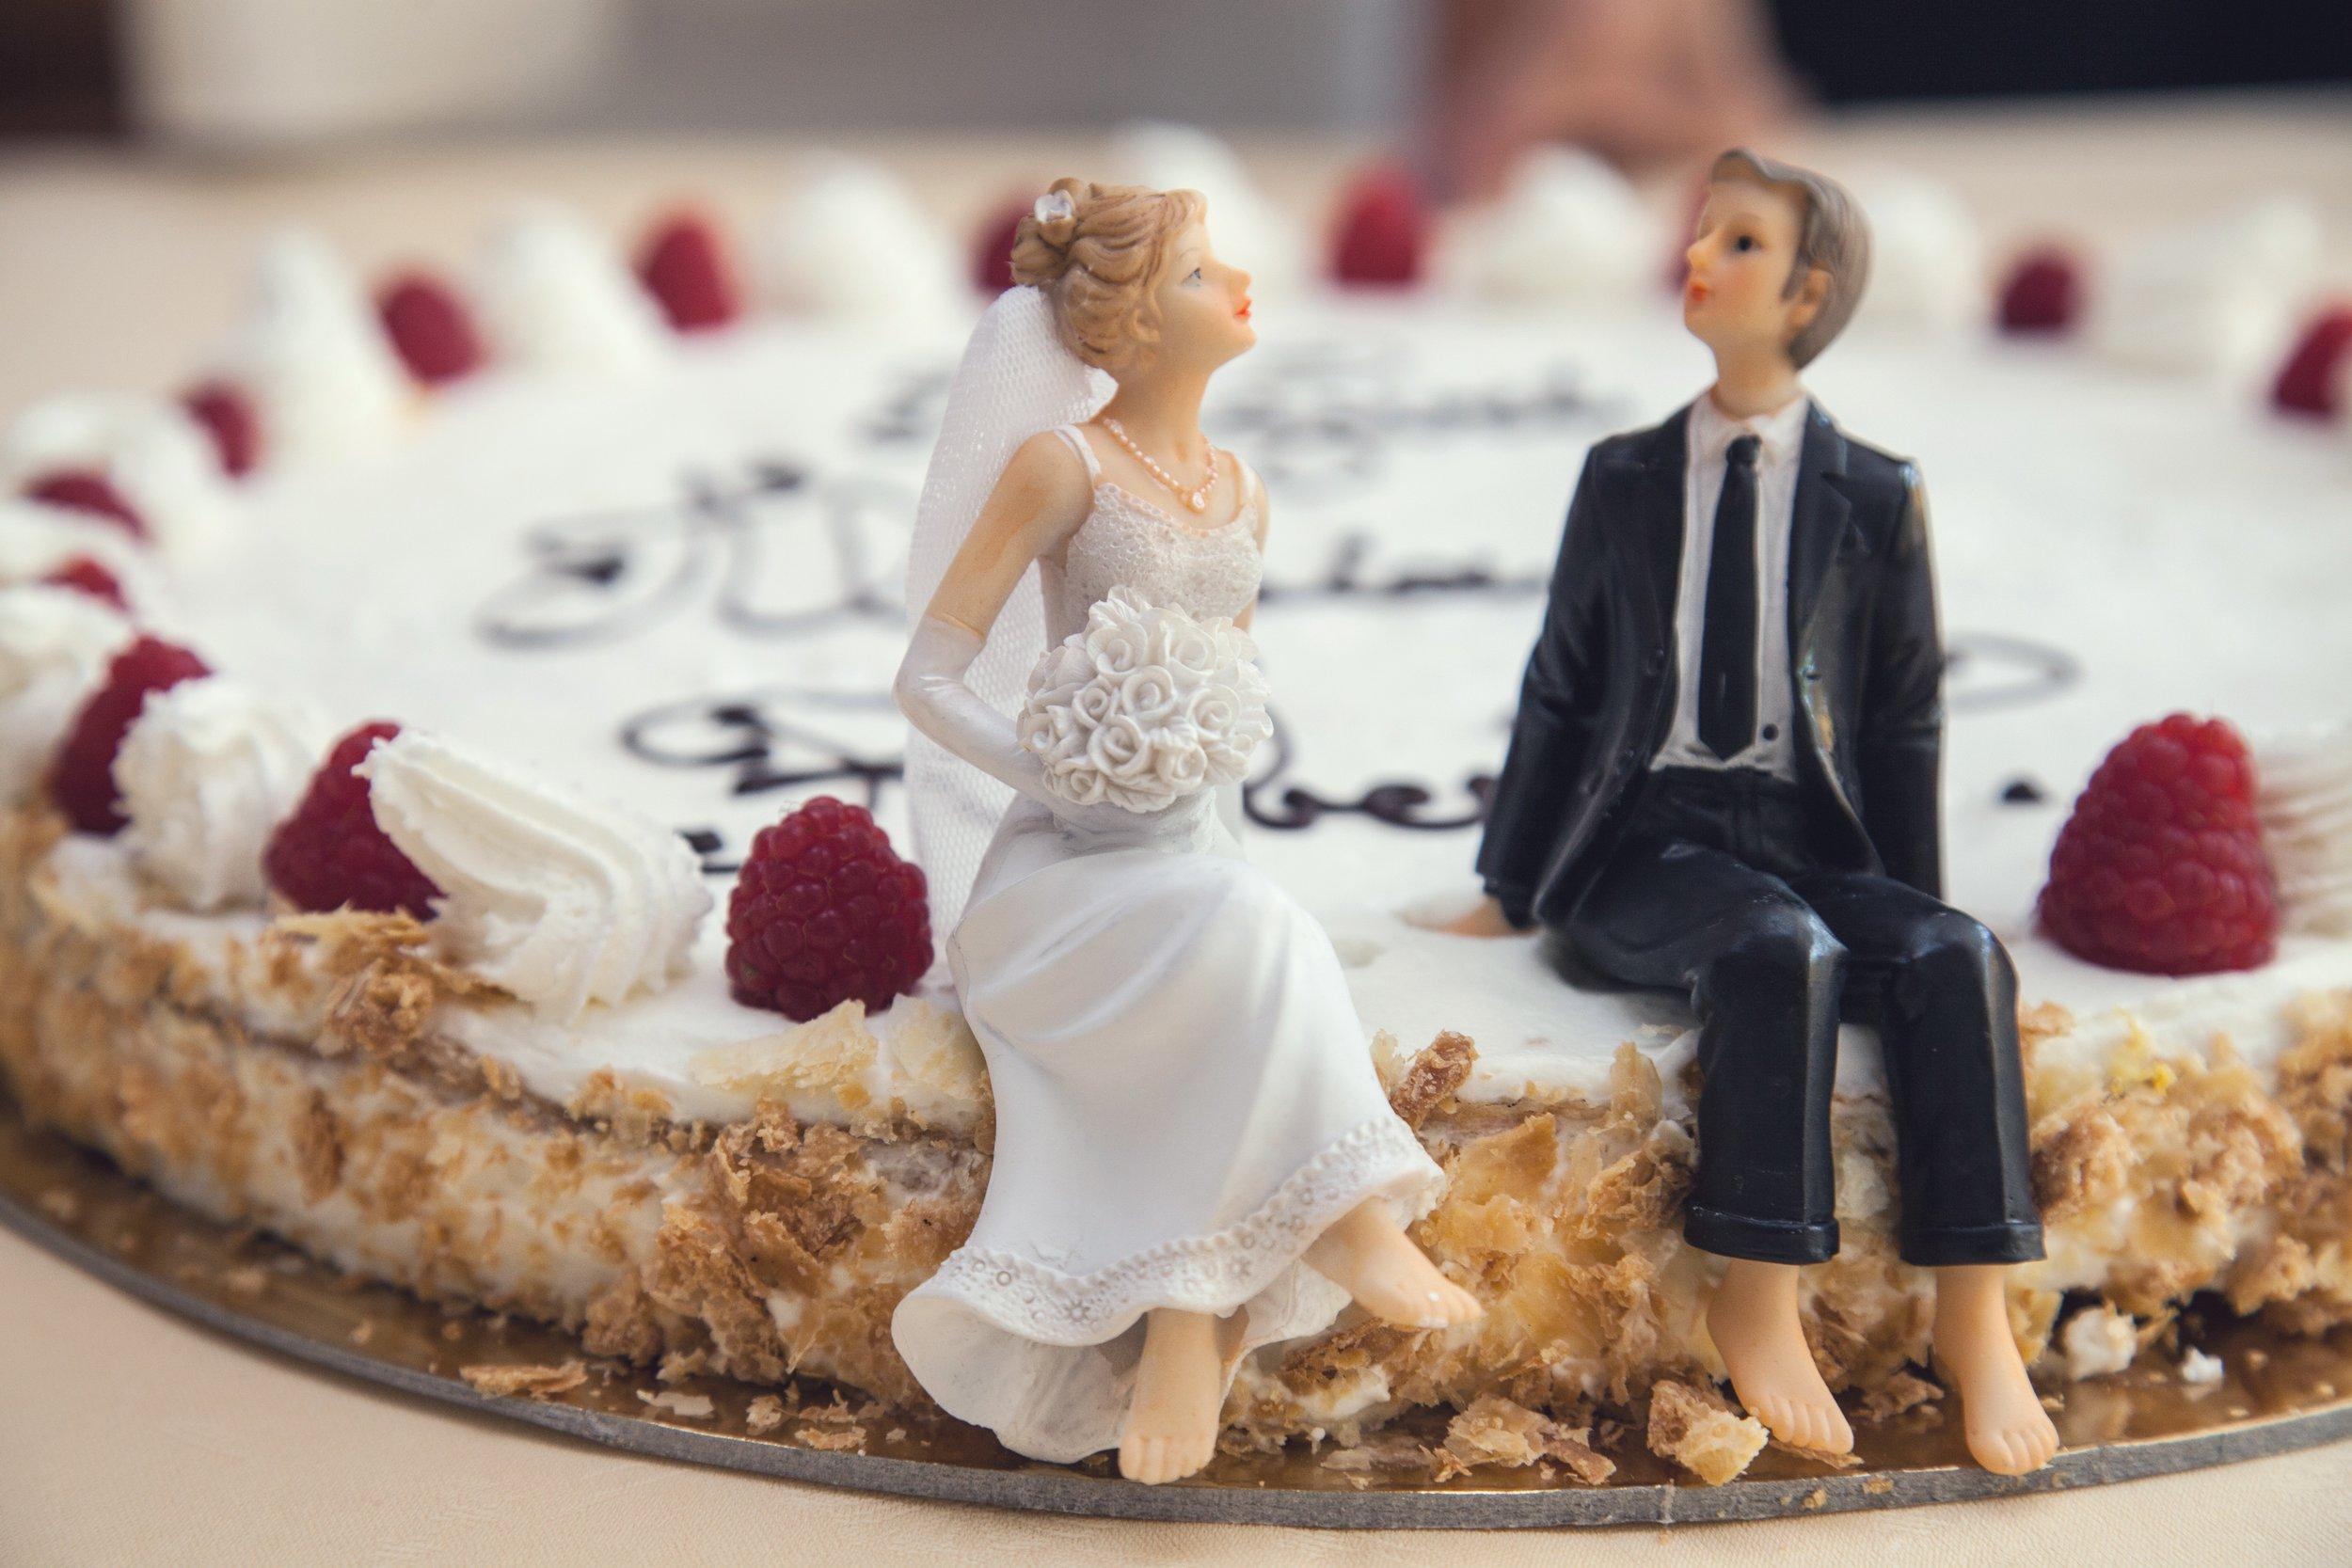 bride-cake-ceremony-2226.jpg